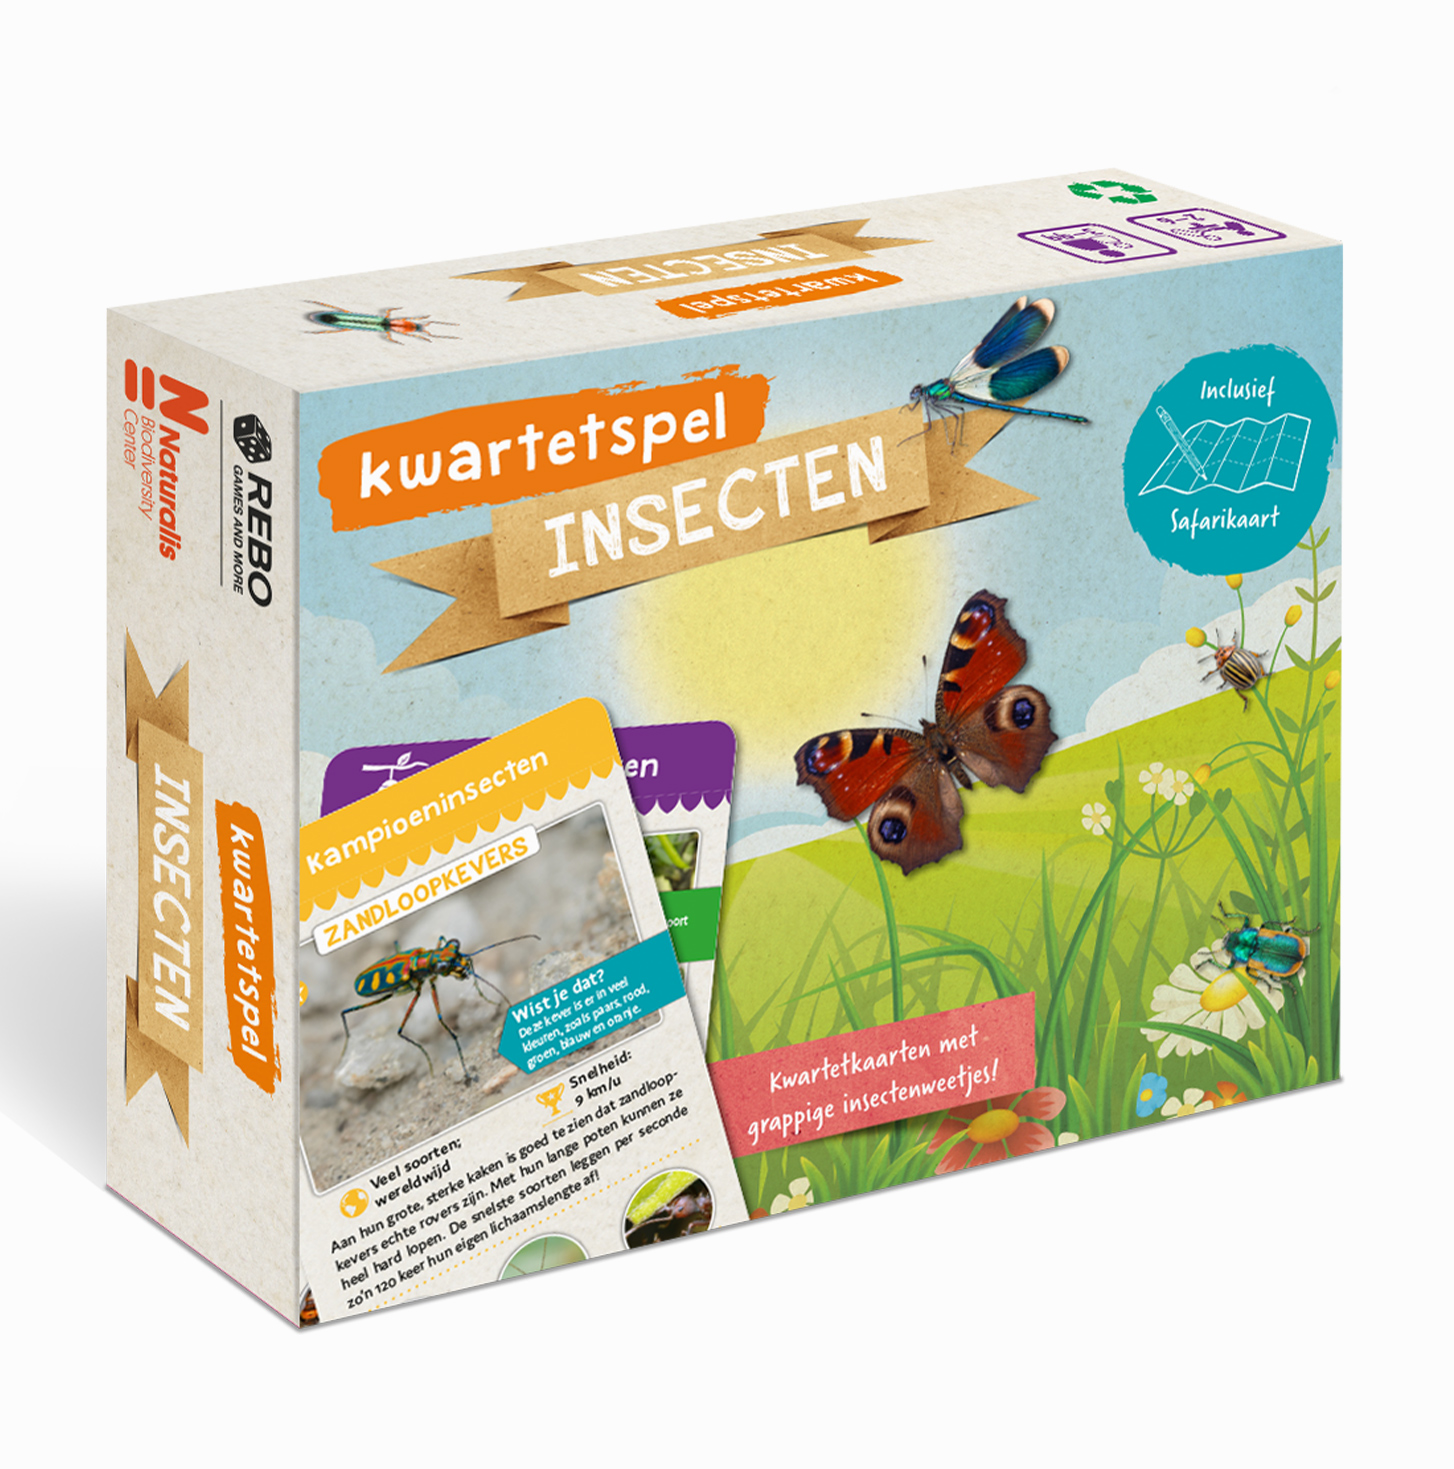 Kwartetspel Insecten